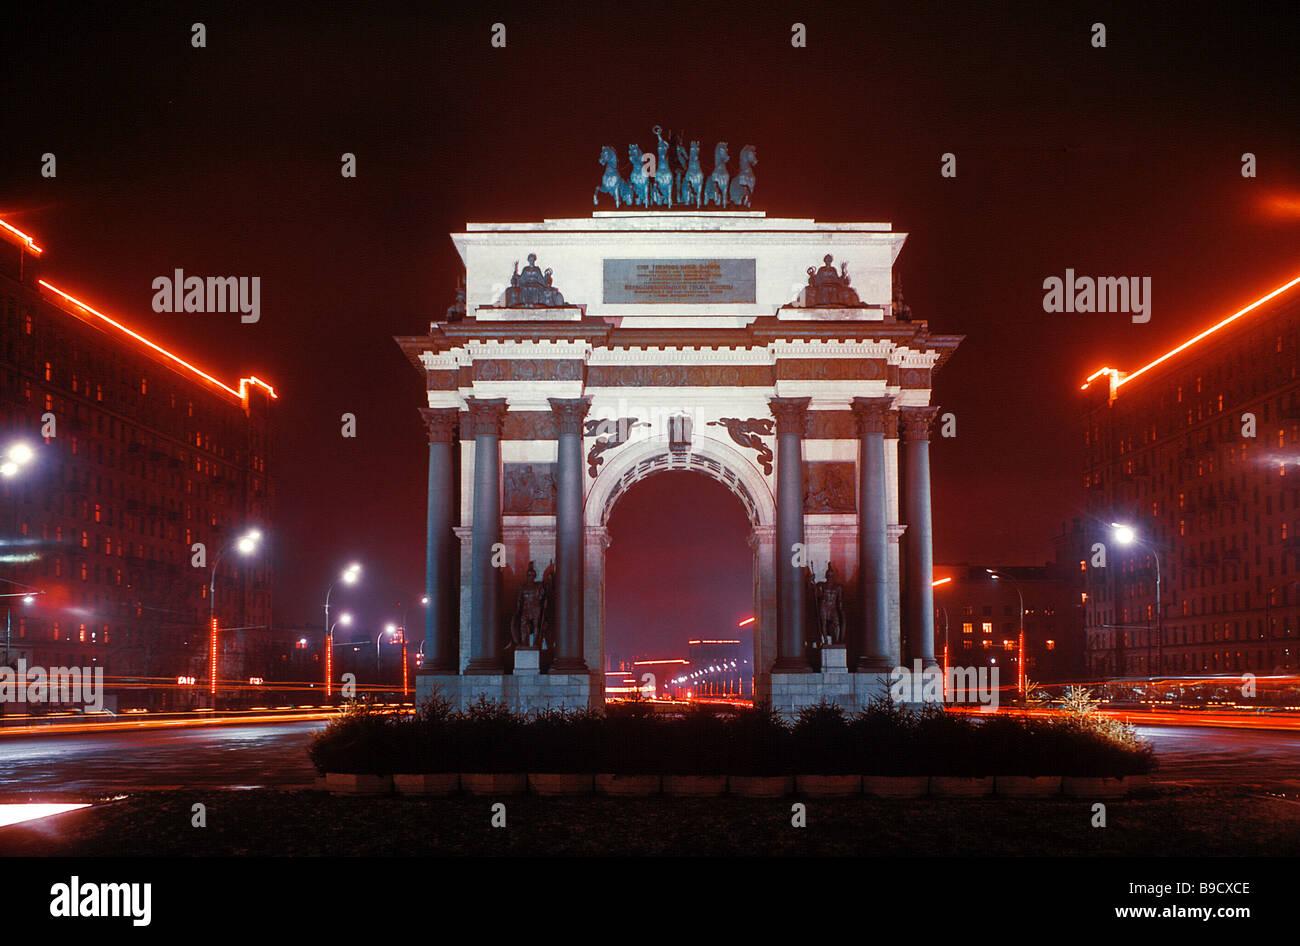 Arch of Triumph on Kutuzov Avenue in the evening - Stock Image